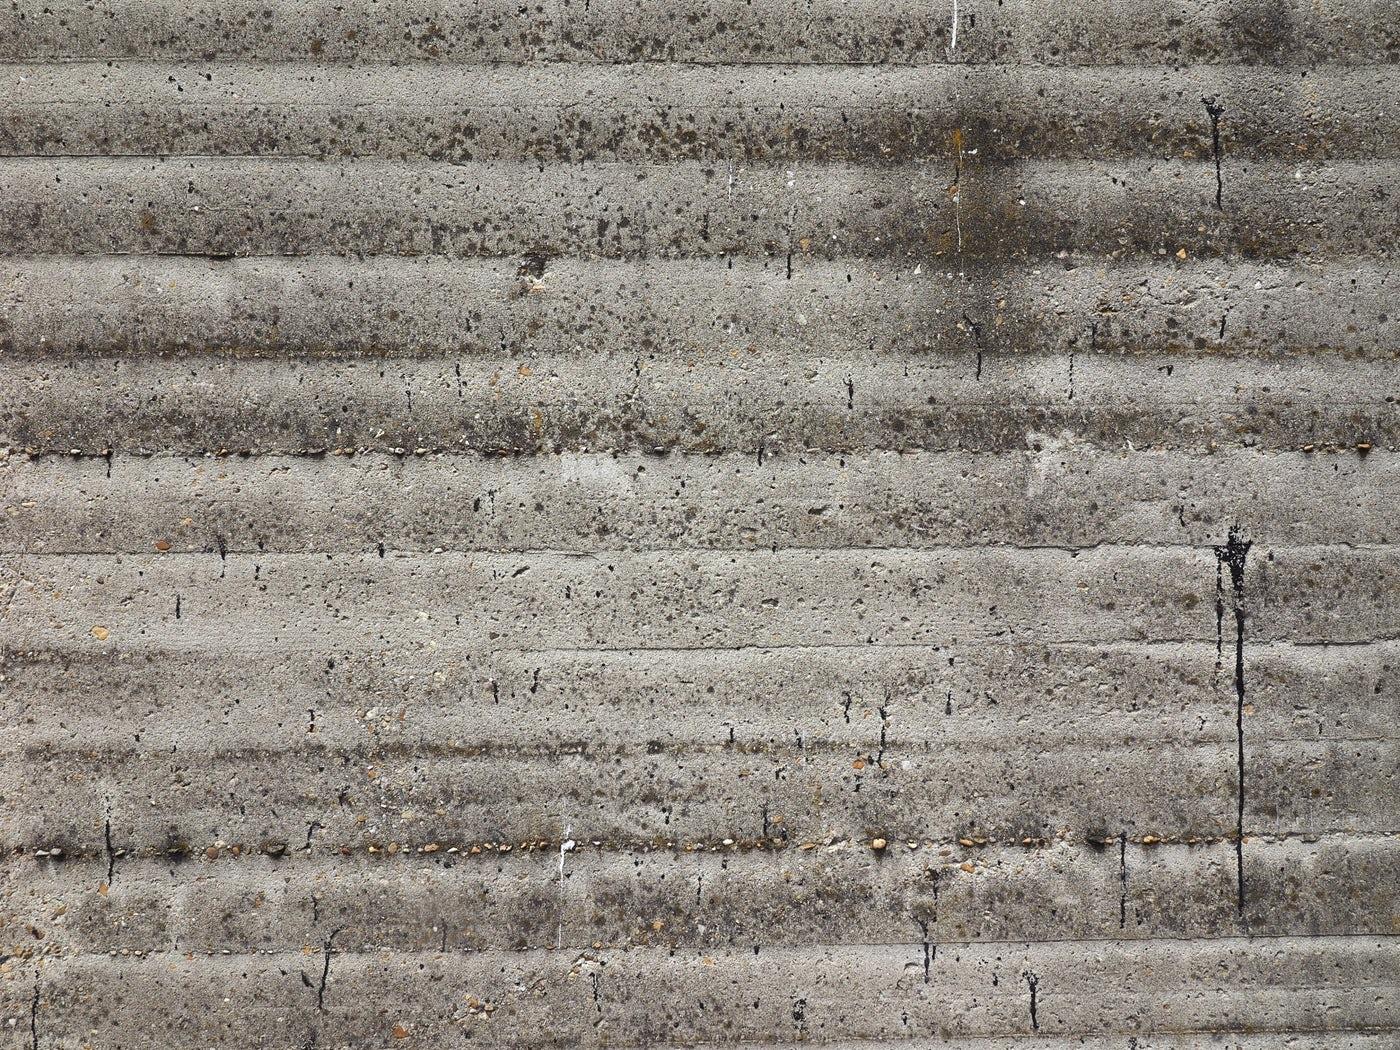 Grunge Concrete Wall Background: Stock Photos